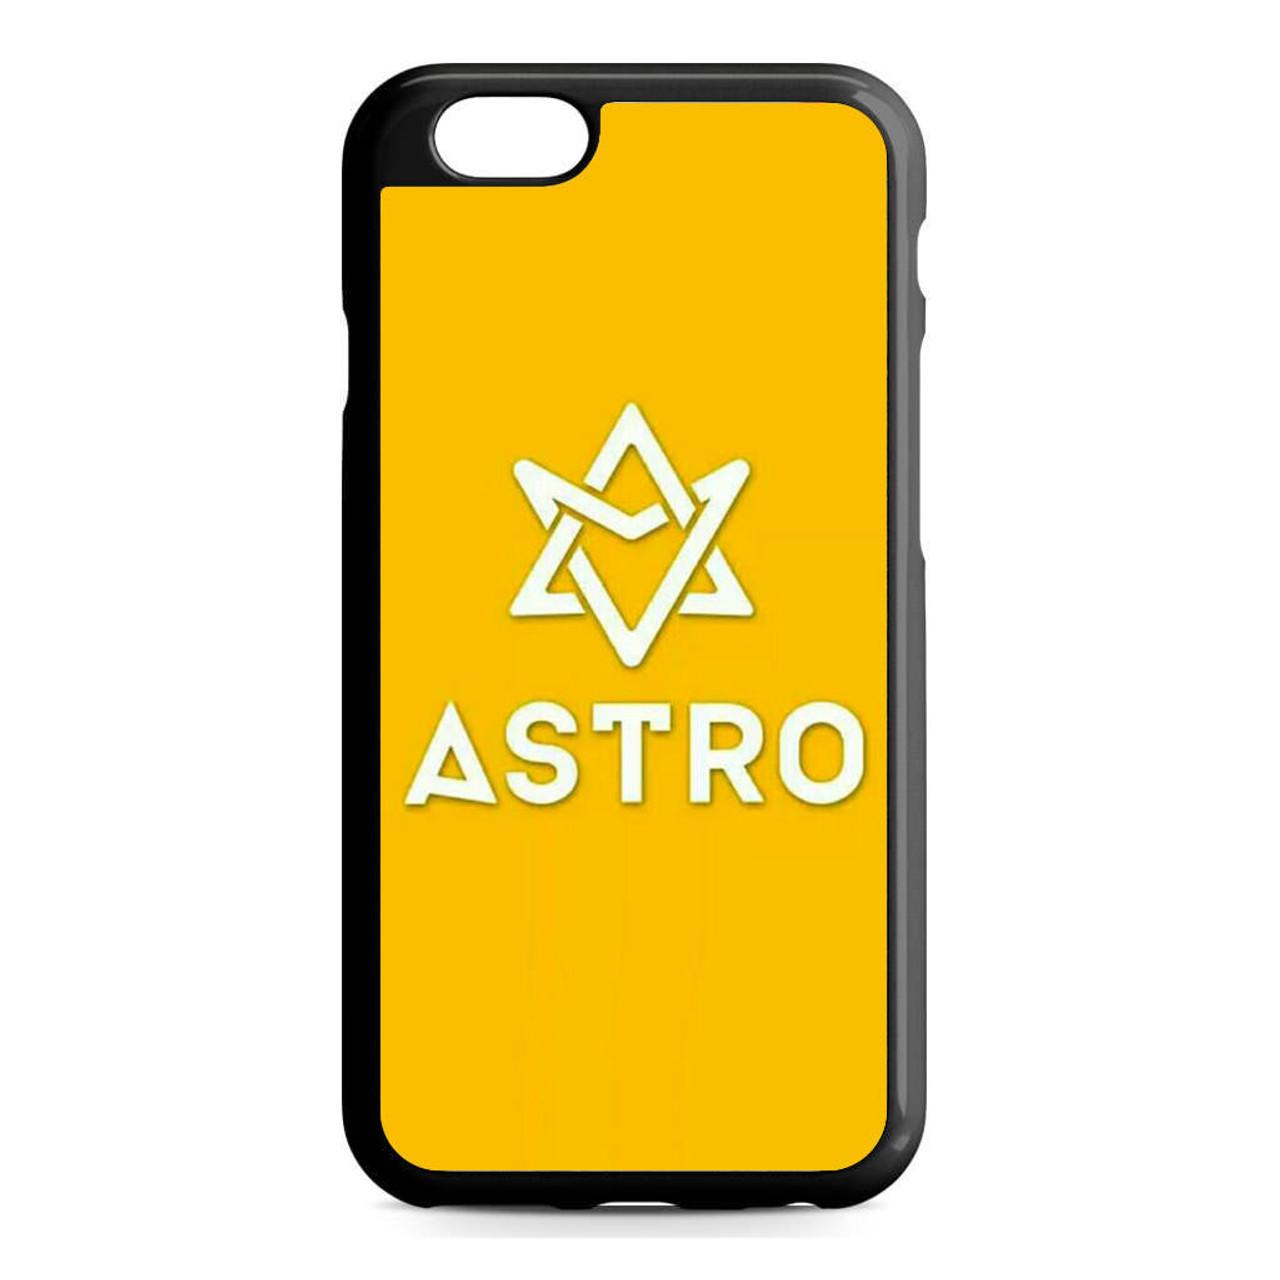 newest 7d5ac baa14 Astro KPop iPhone 6/6S Case